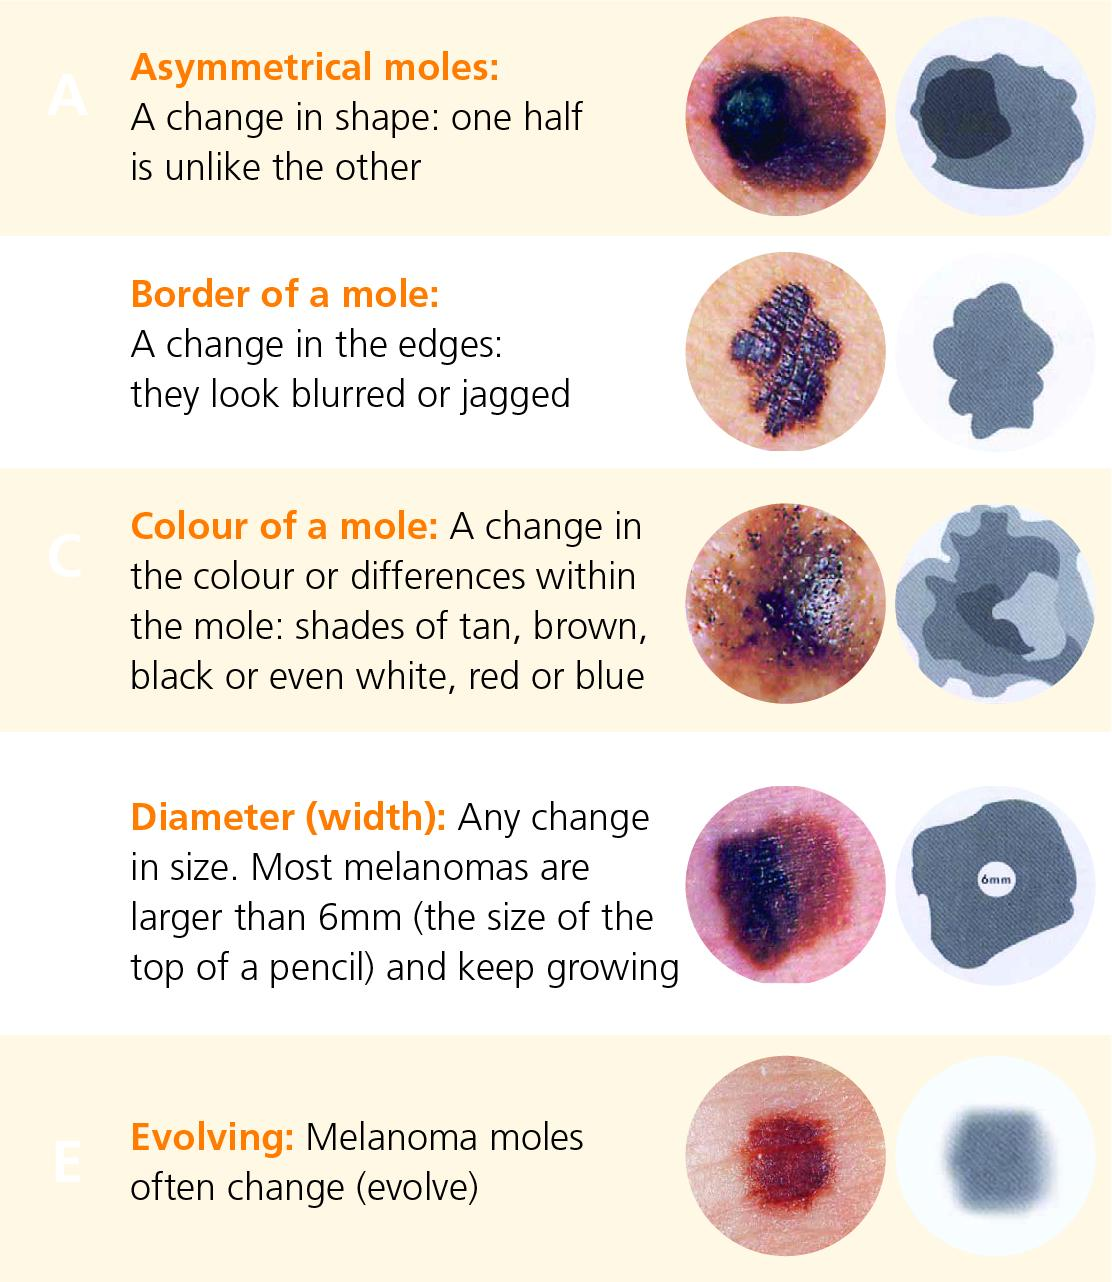 Symptoms And Diagnosis Of Melanoma Irish Cancer Society